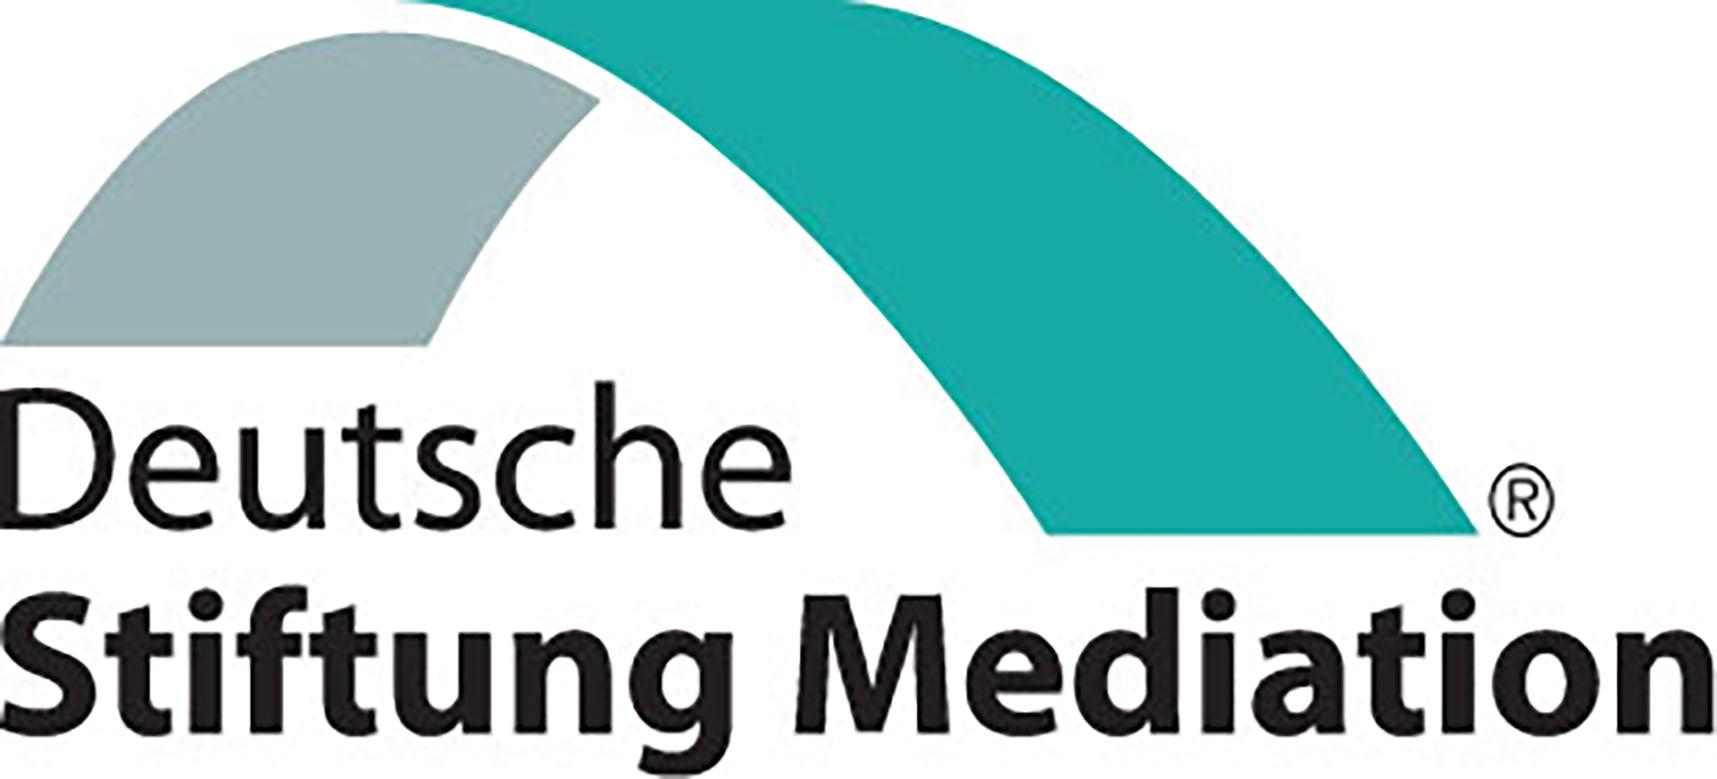 Stiftung Mediation